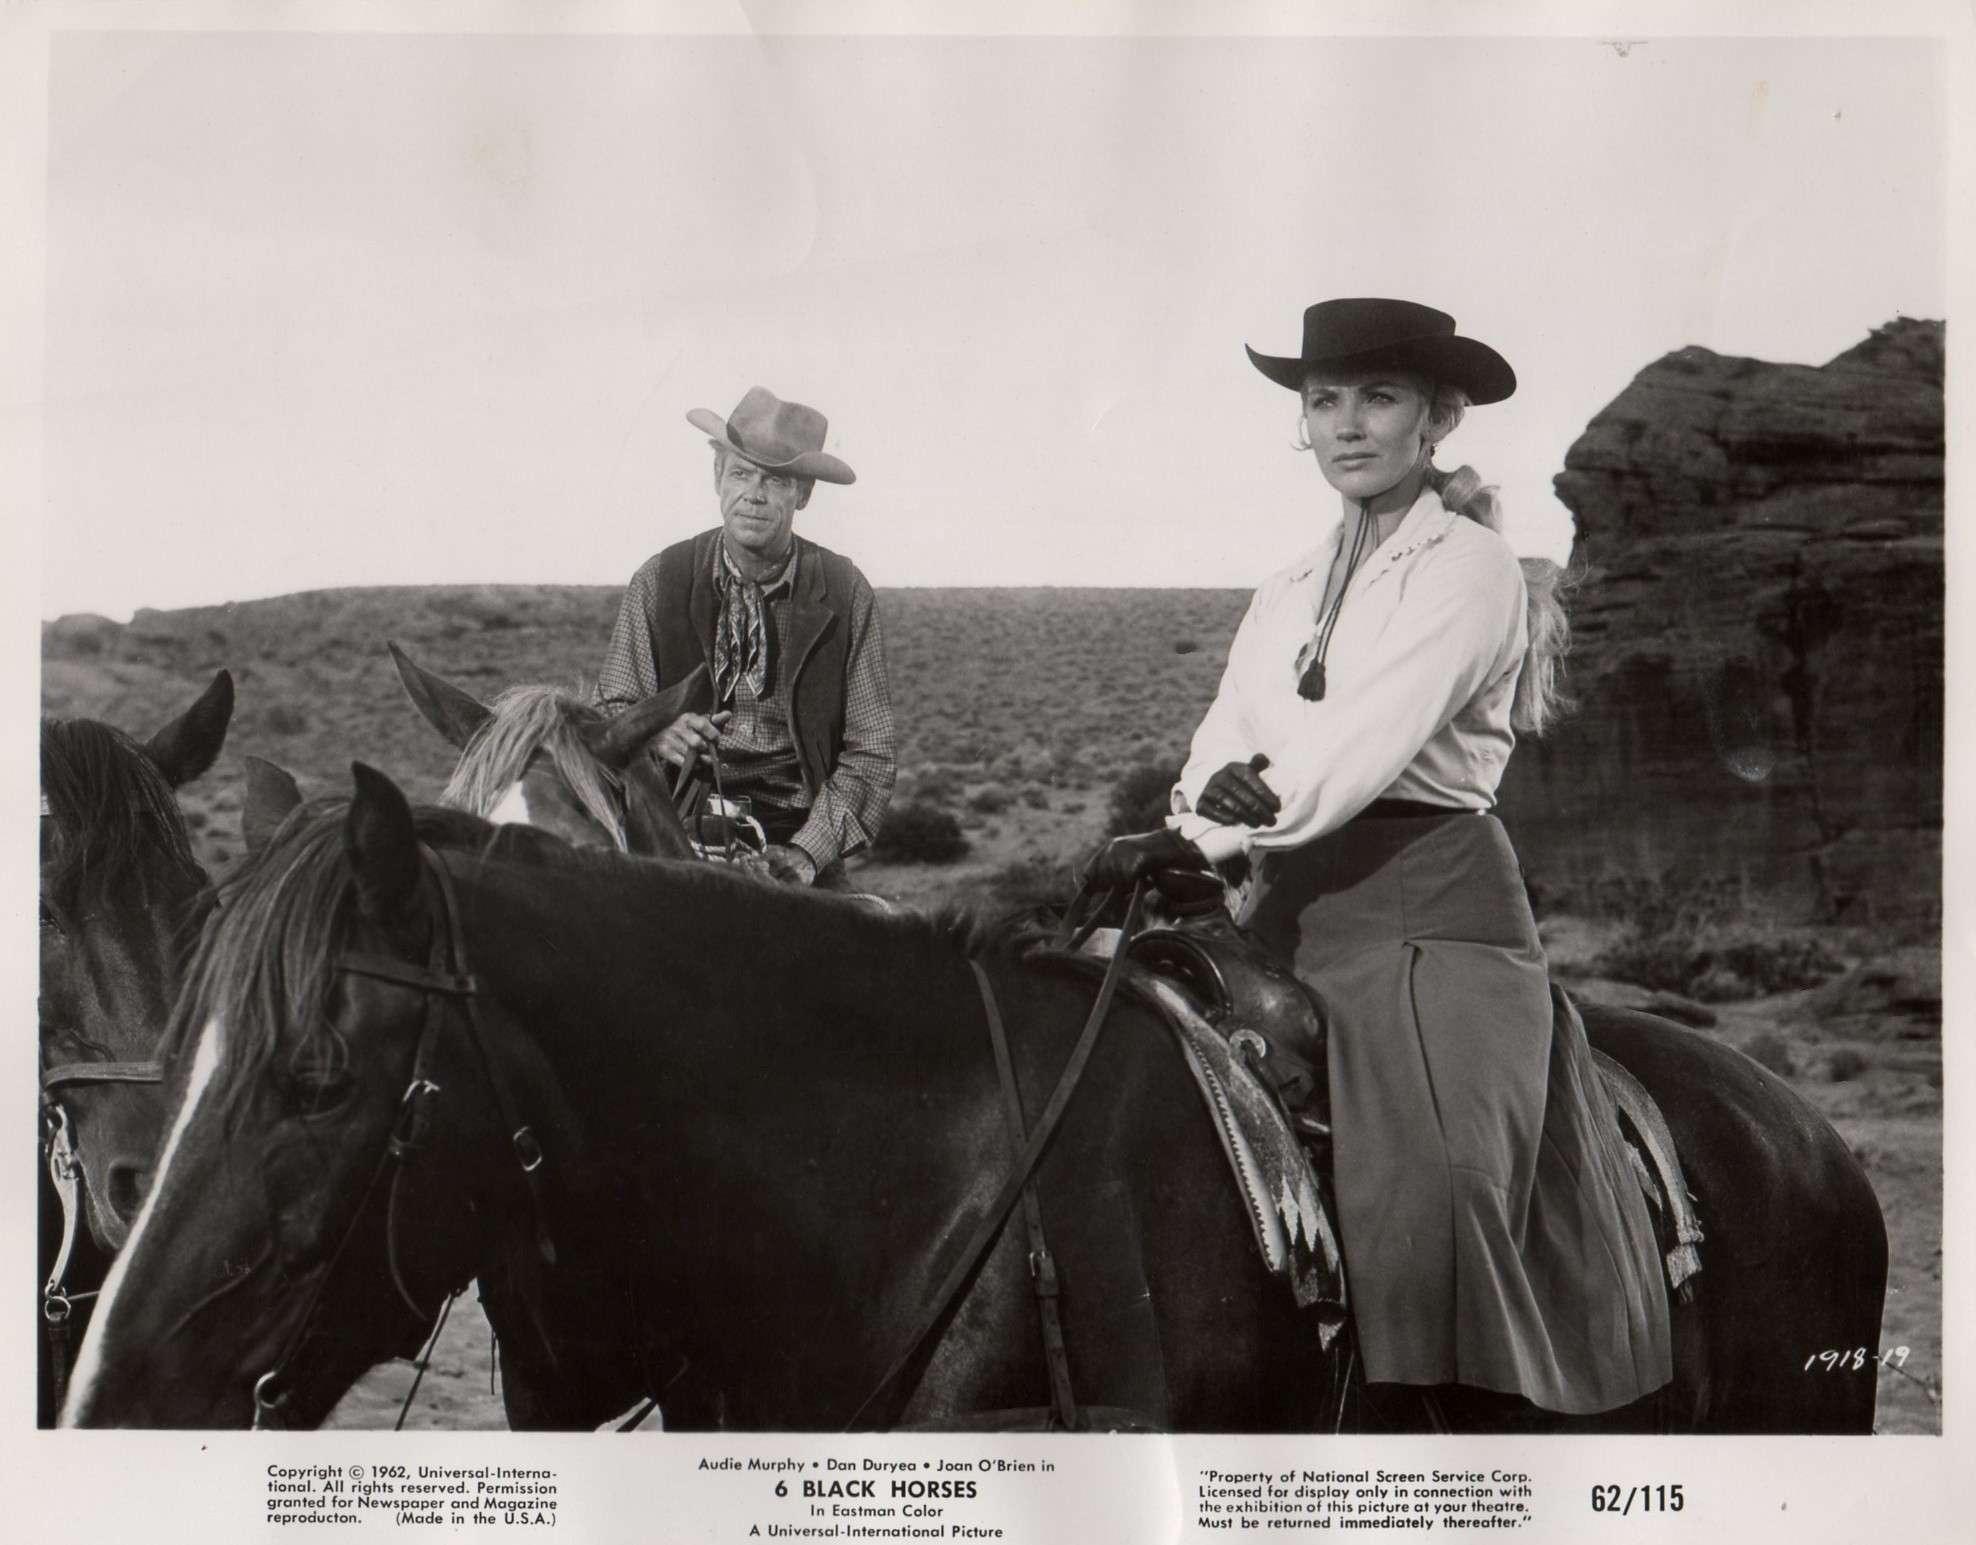 Dan Duryea and Joan O'Brien in Six Black Horses (1962)